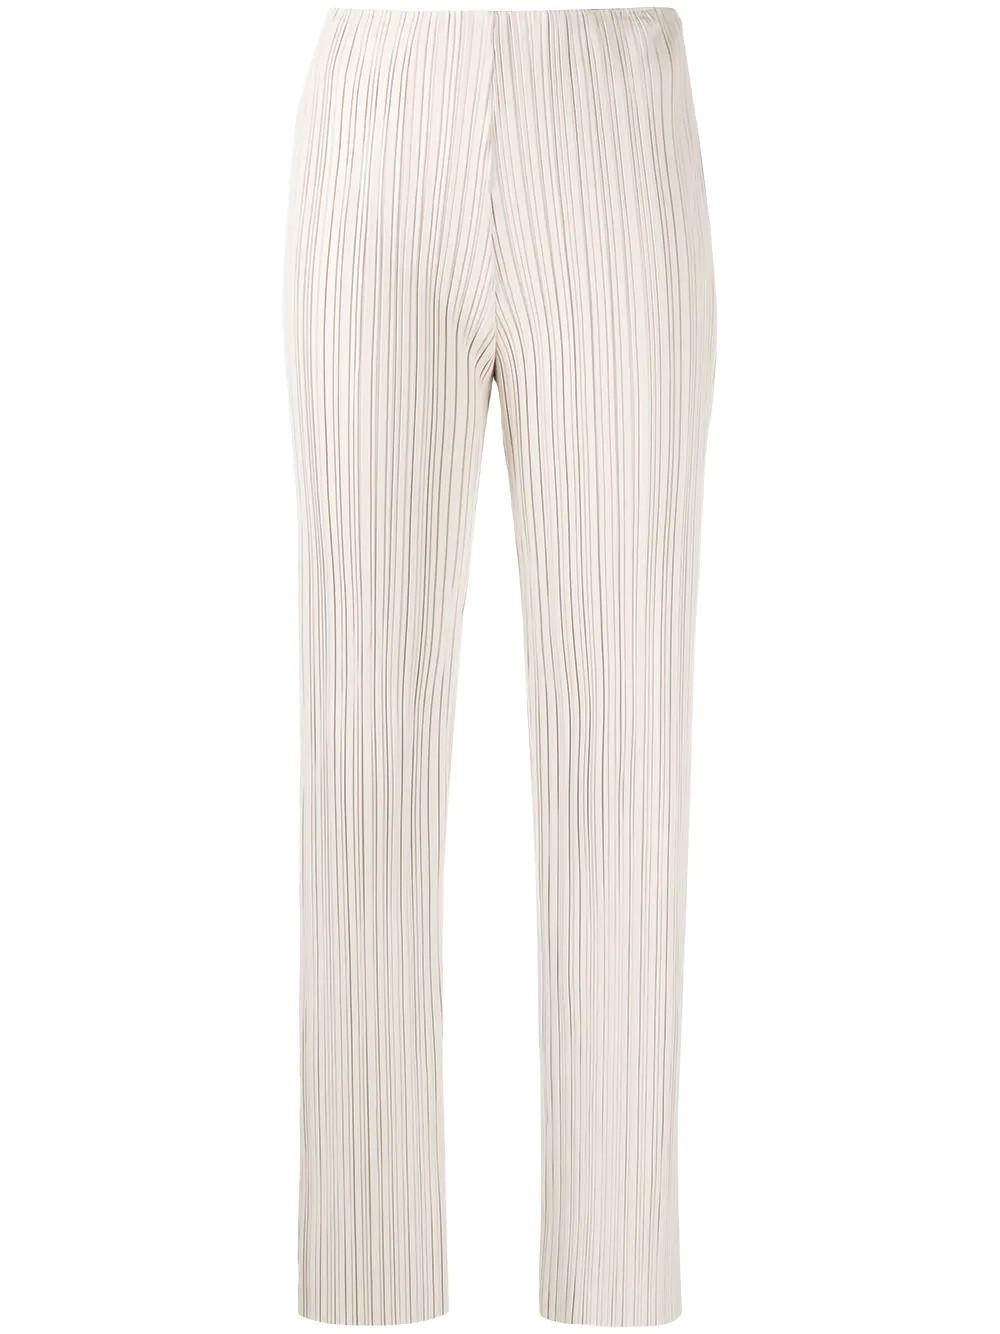 straight leg pleat pants